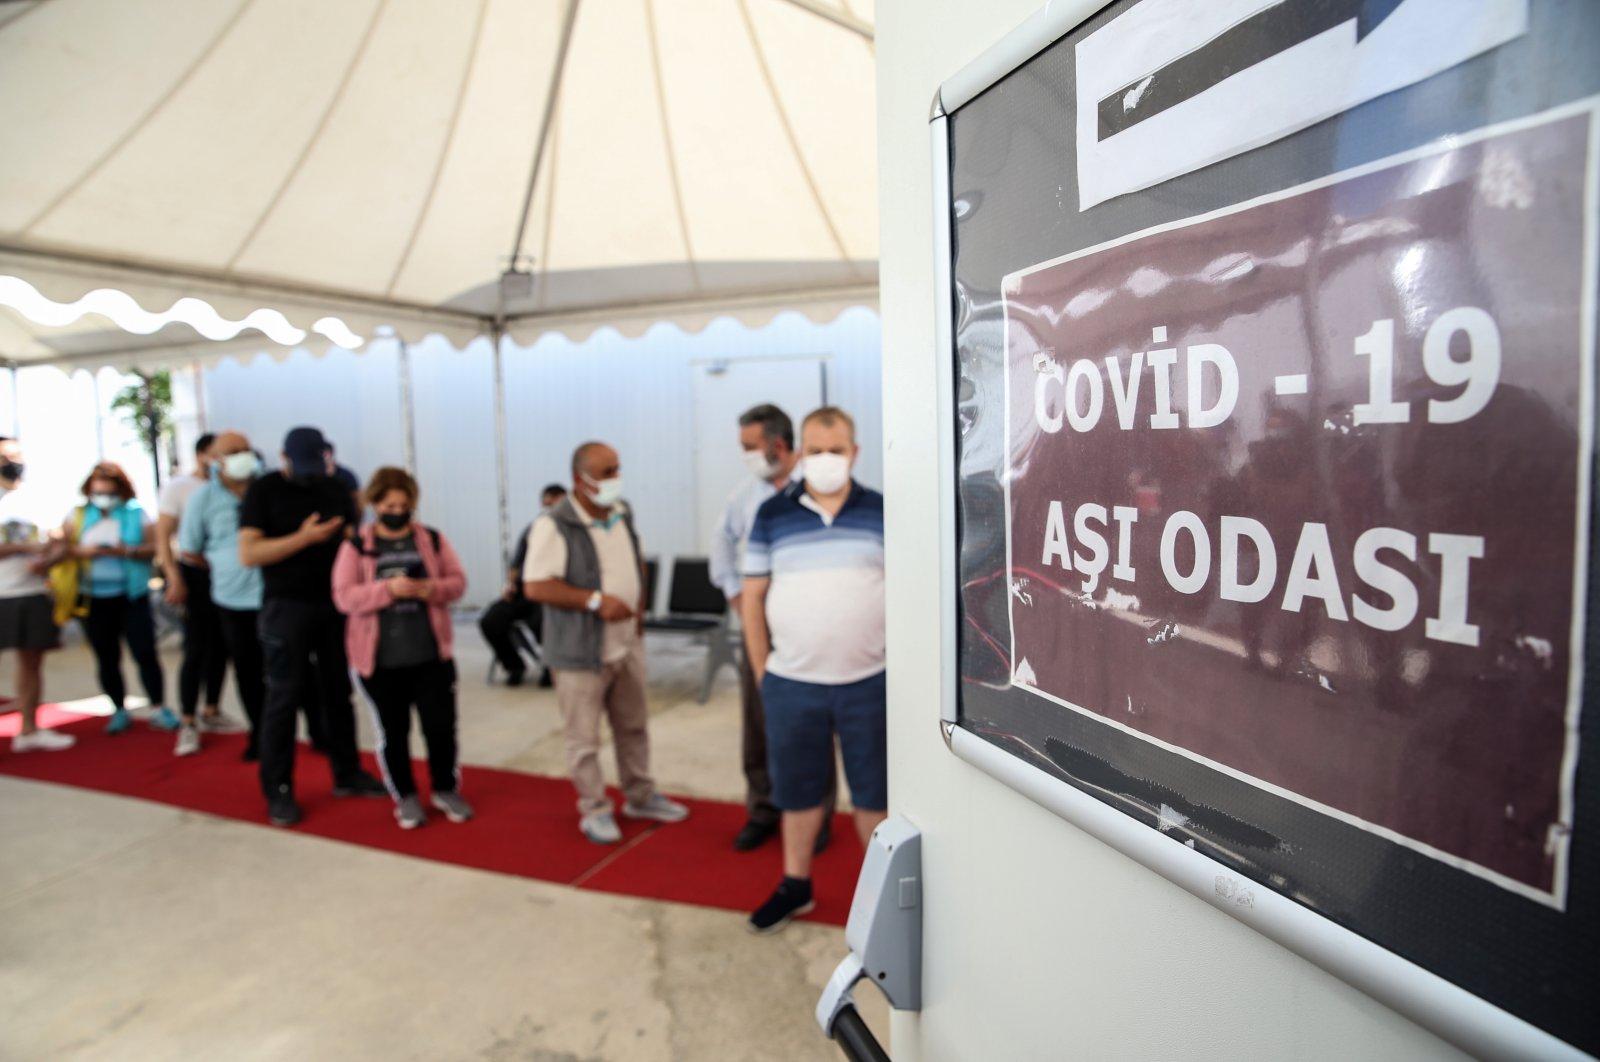 People wait for vaccinations at Professor Feriha Öz Emergency Hospital, in Istanbul, Turkey, June 10, 2021. (AA PHOTO)